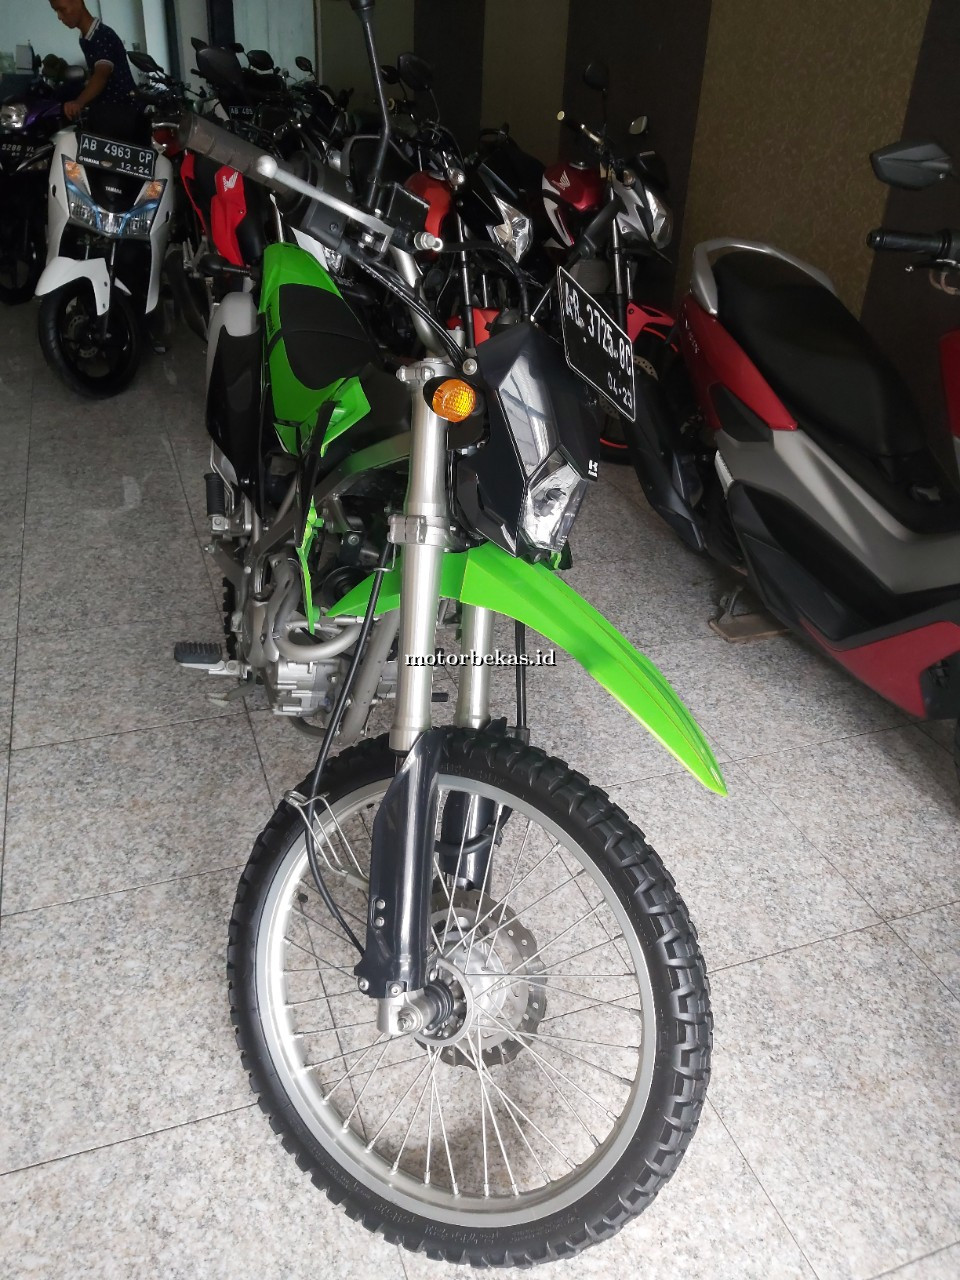 KAWASAKI KLX 150 BF  73 motorbekas.id